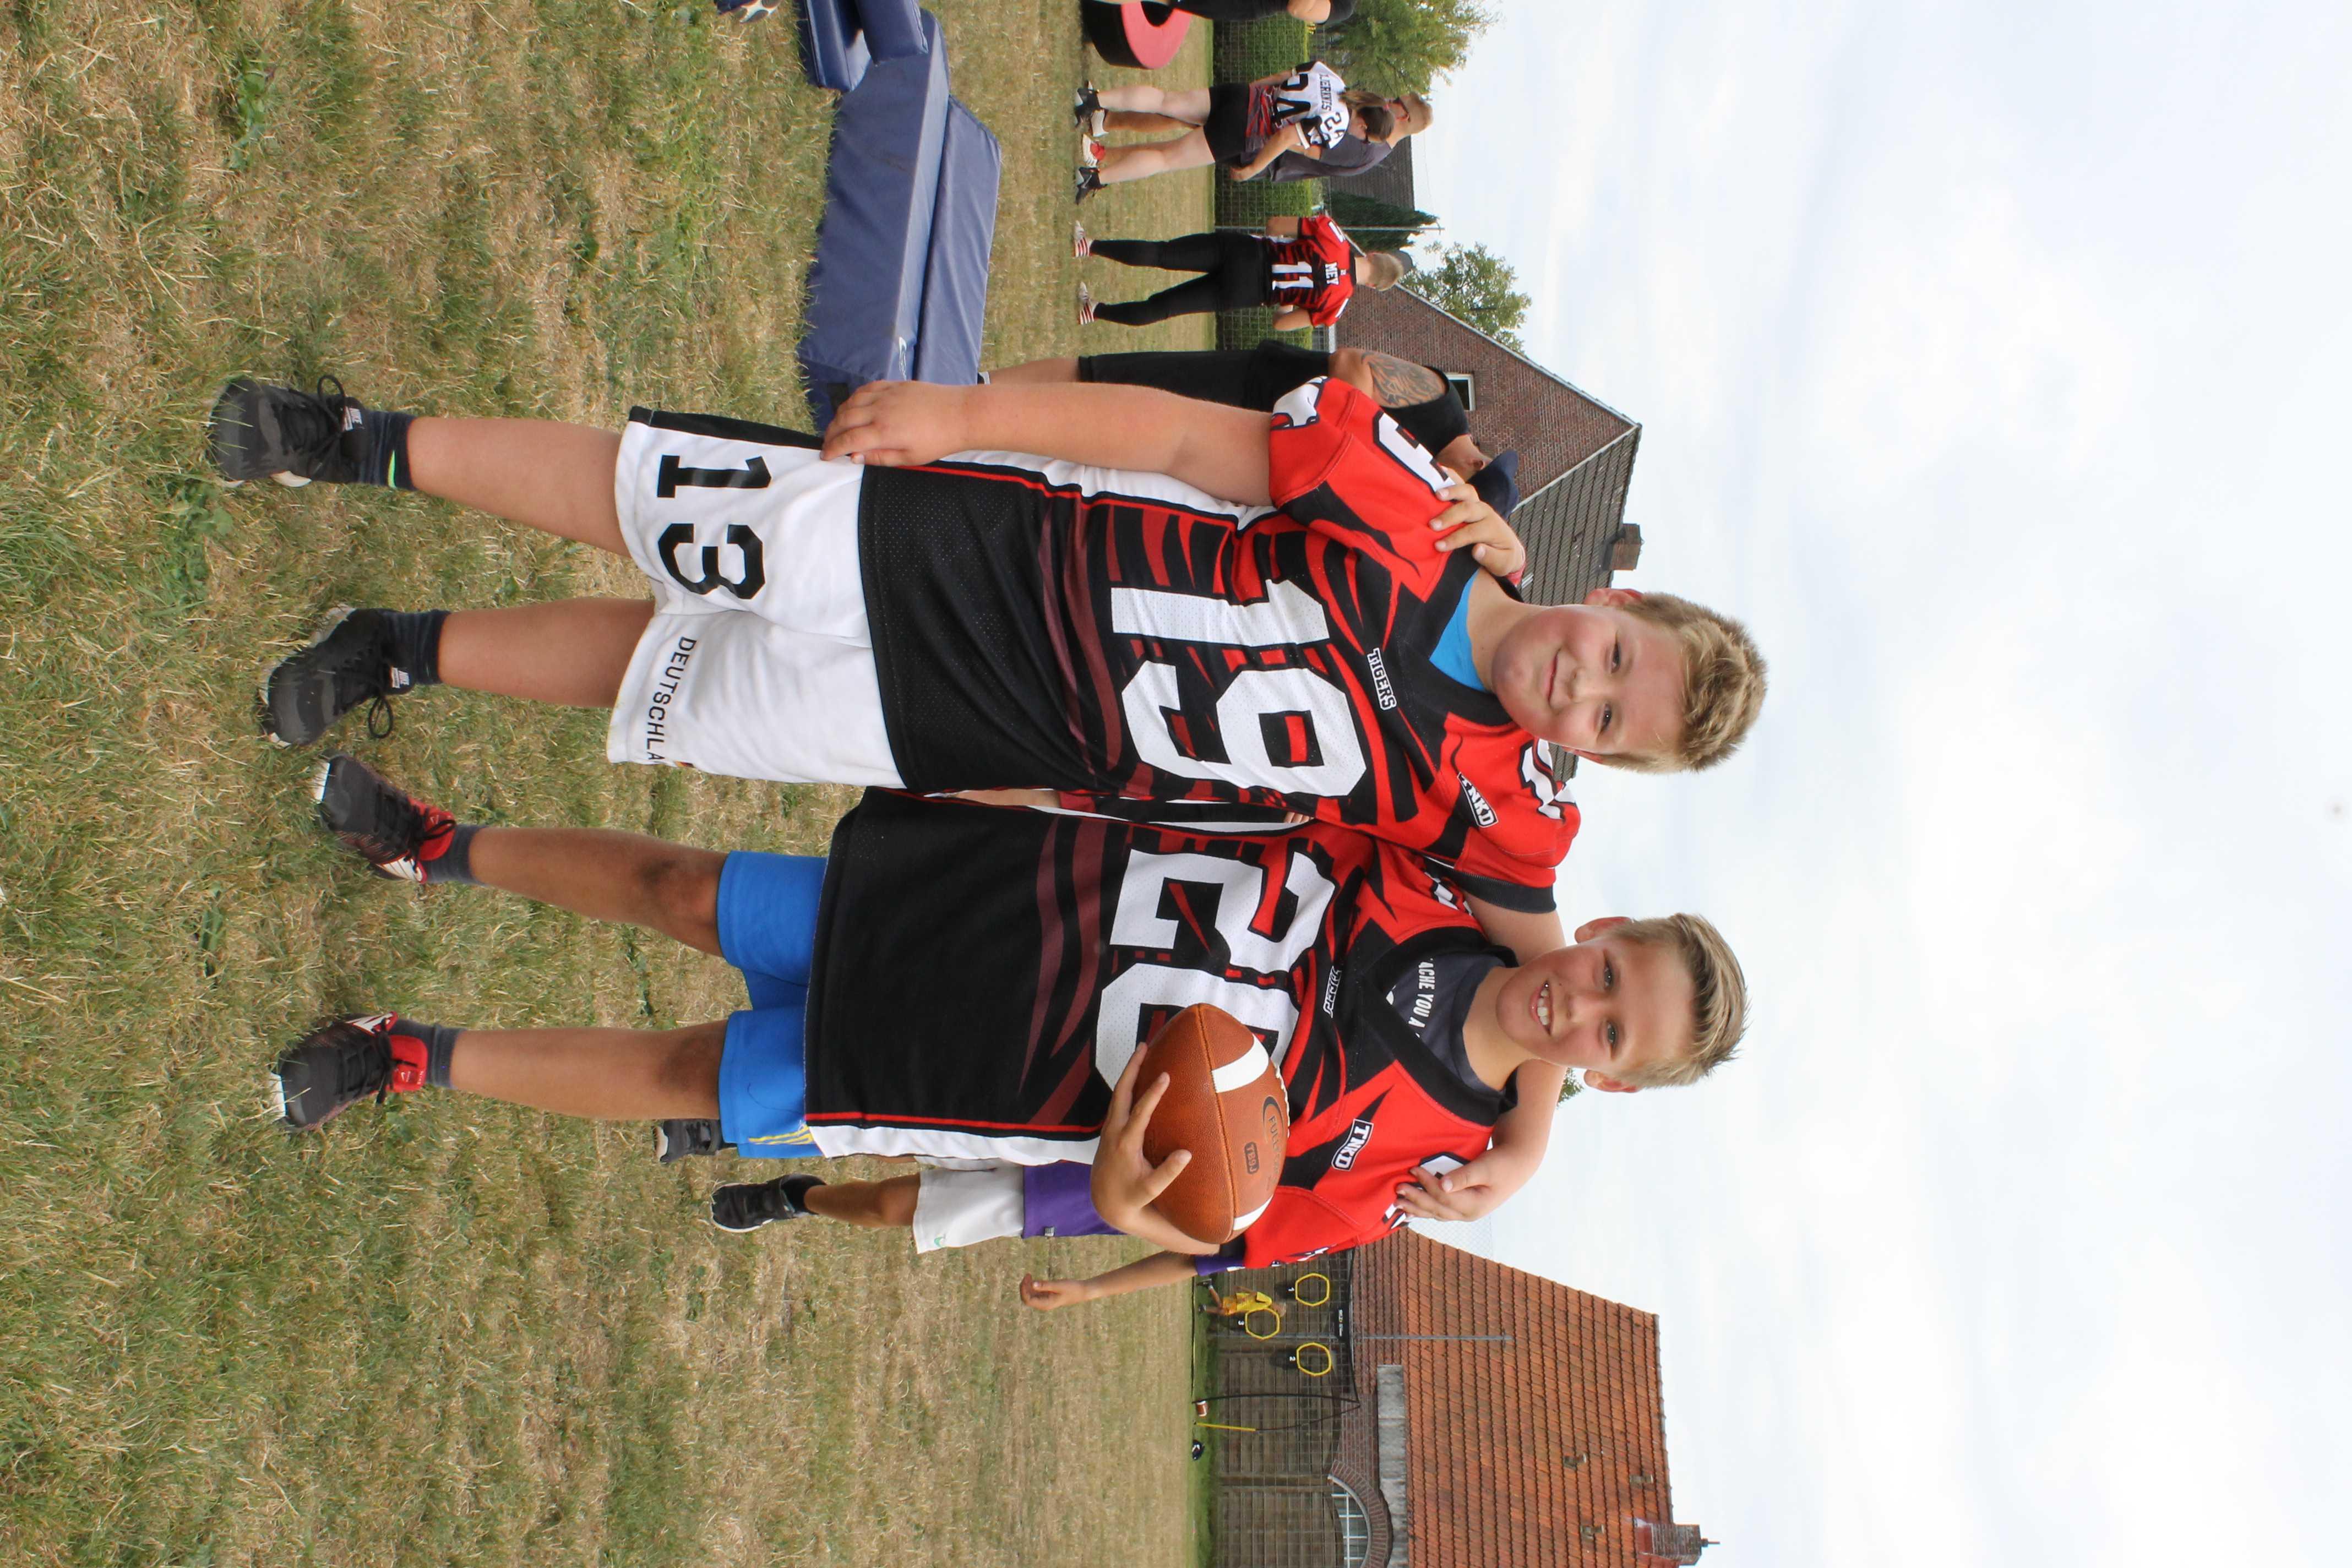 2018-07-29 Sportwoche - Sportpicknick & Football & Fußball (60)